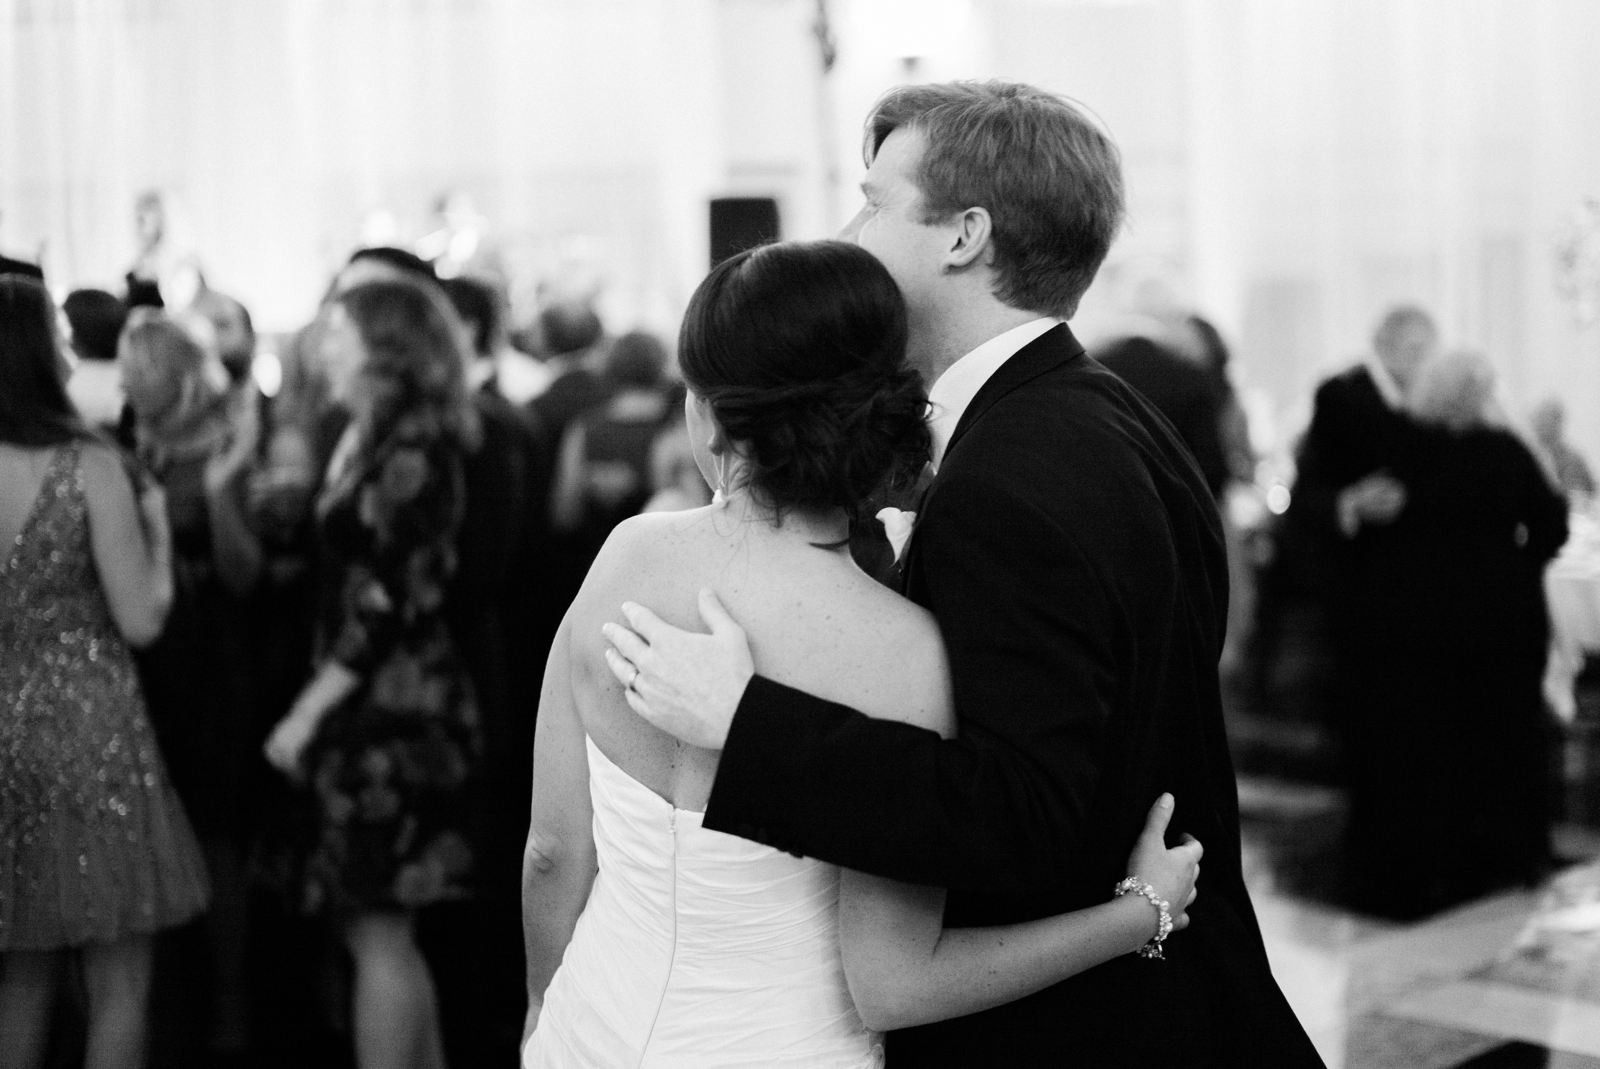 atrium at curtis center wedding photographer philadelphia wedding photographer shannon griffin_0031.jpg